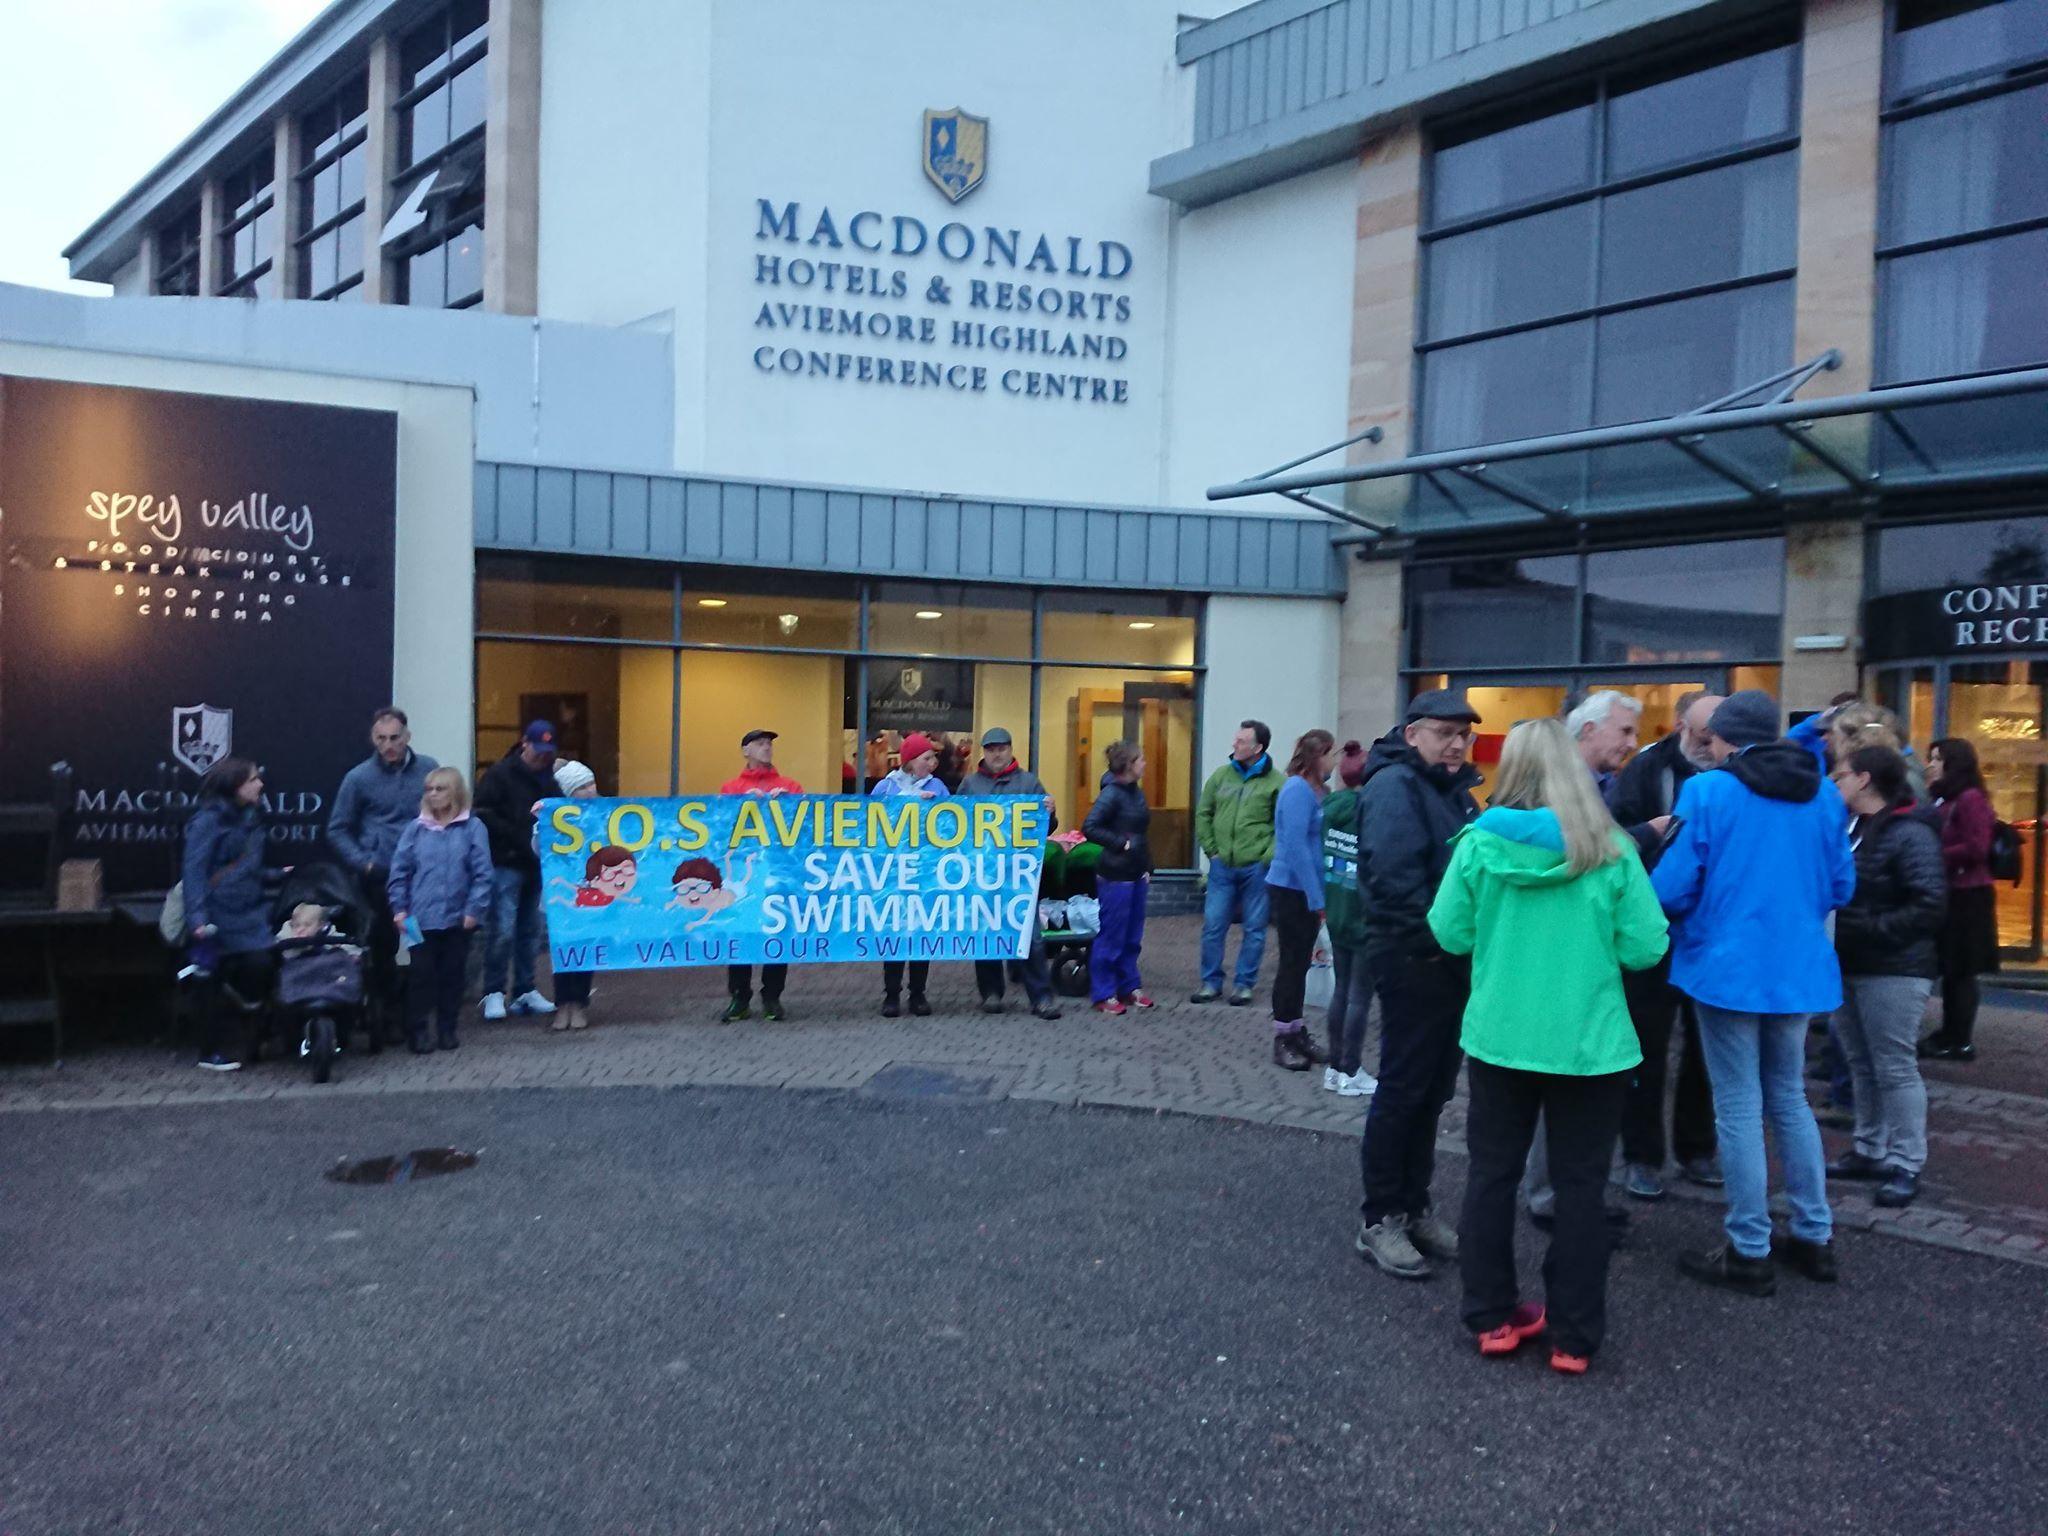 Demonstrators at the Macdonald Aviemore Resort